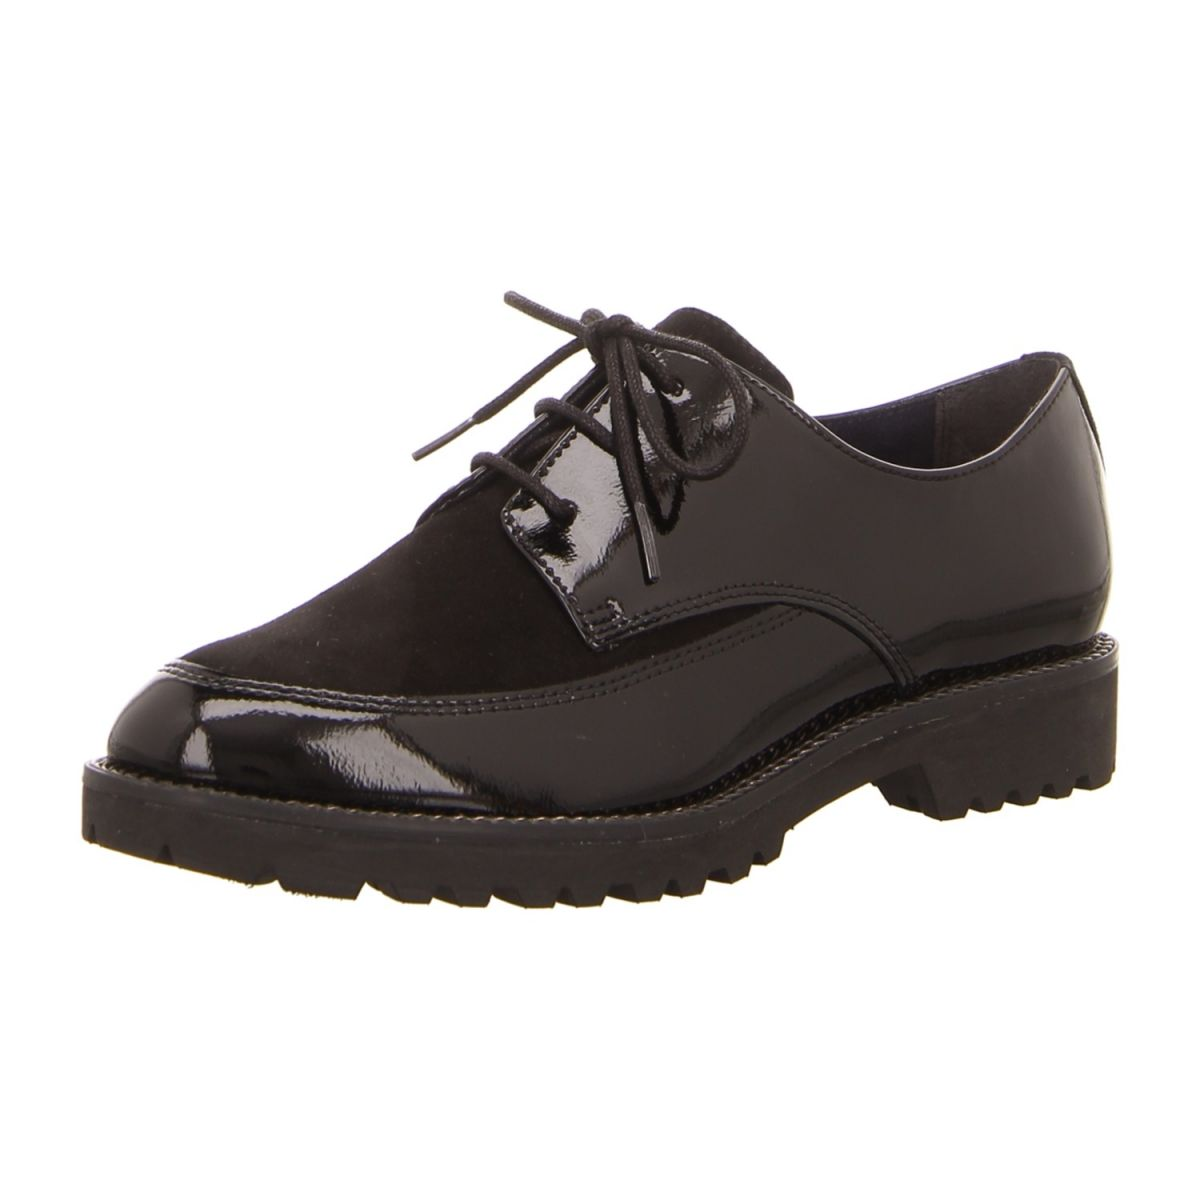 Tamaris Schnürer schwarz   Halbschuhe, Damenschuhe, Schuhe